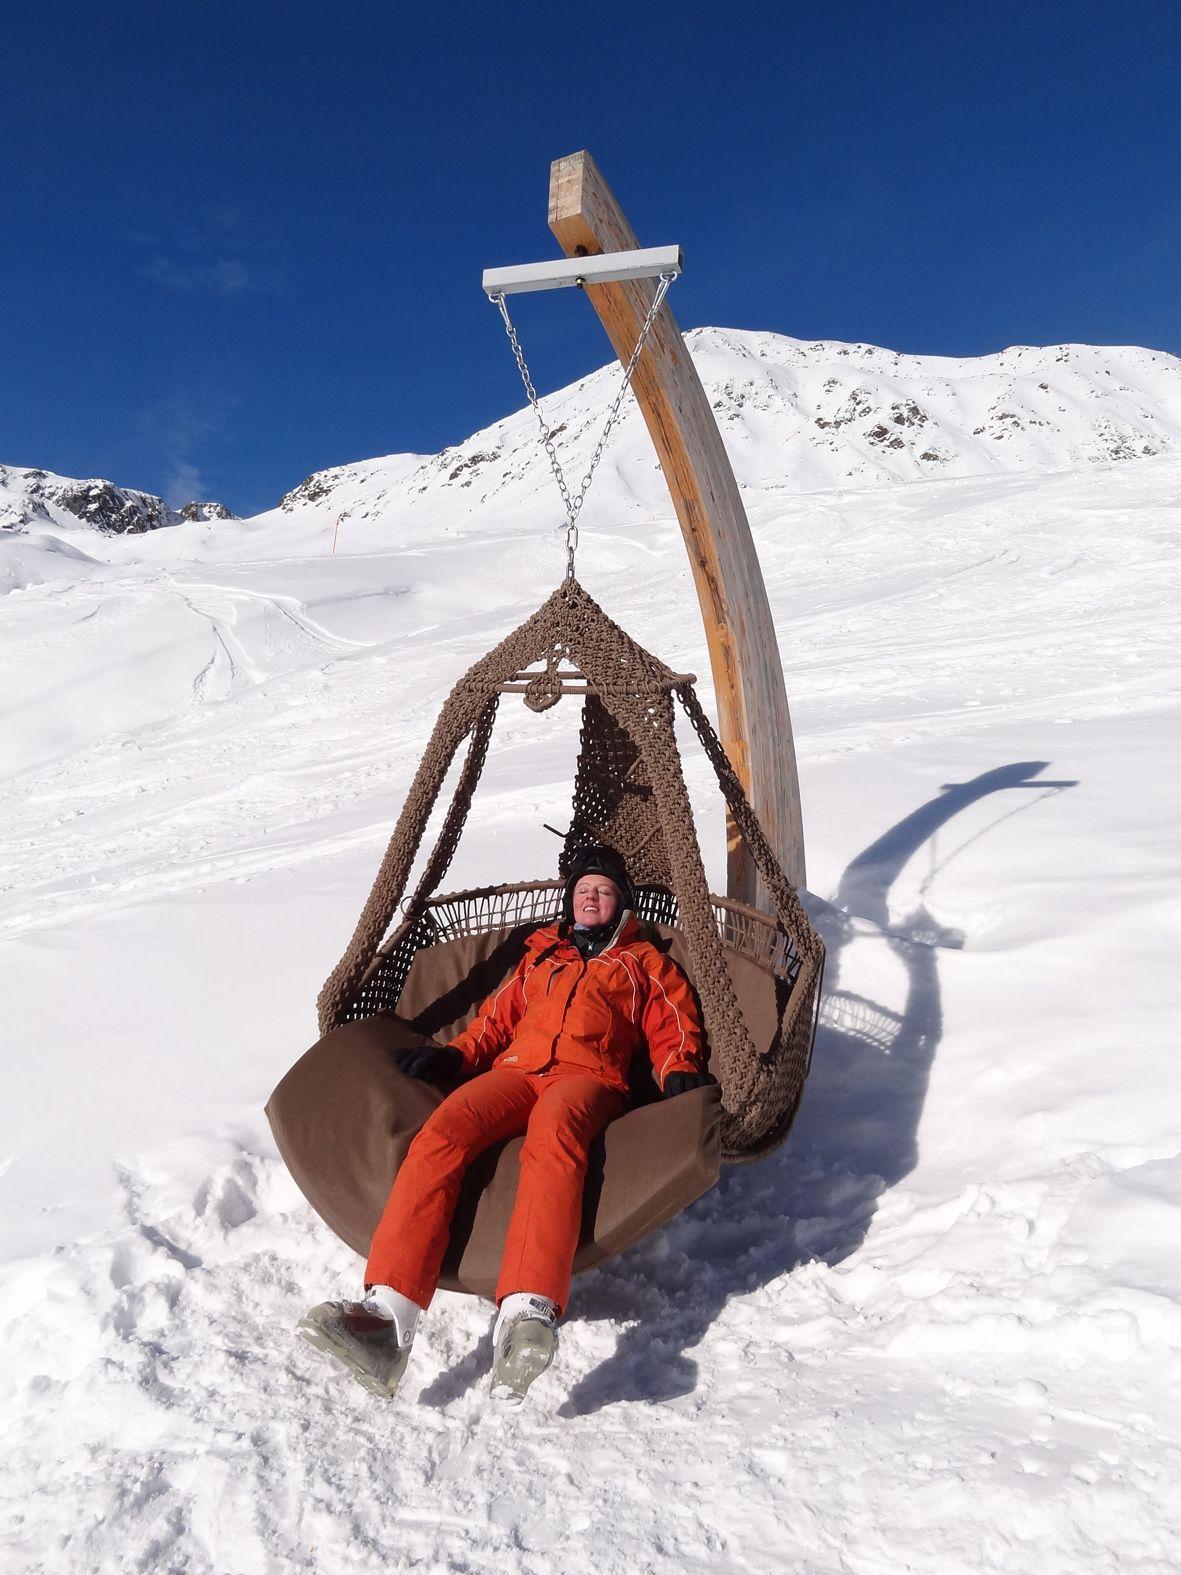 Swing chair in ski resort Serfaus, Austria. Manufacturer